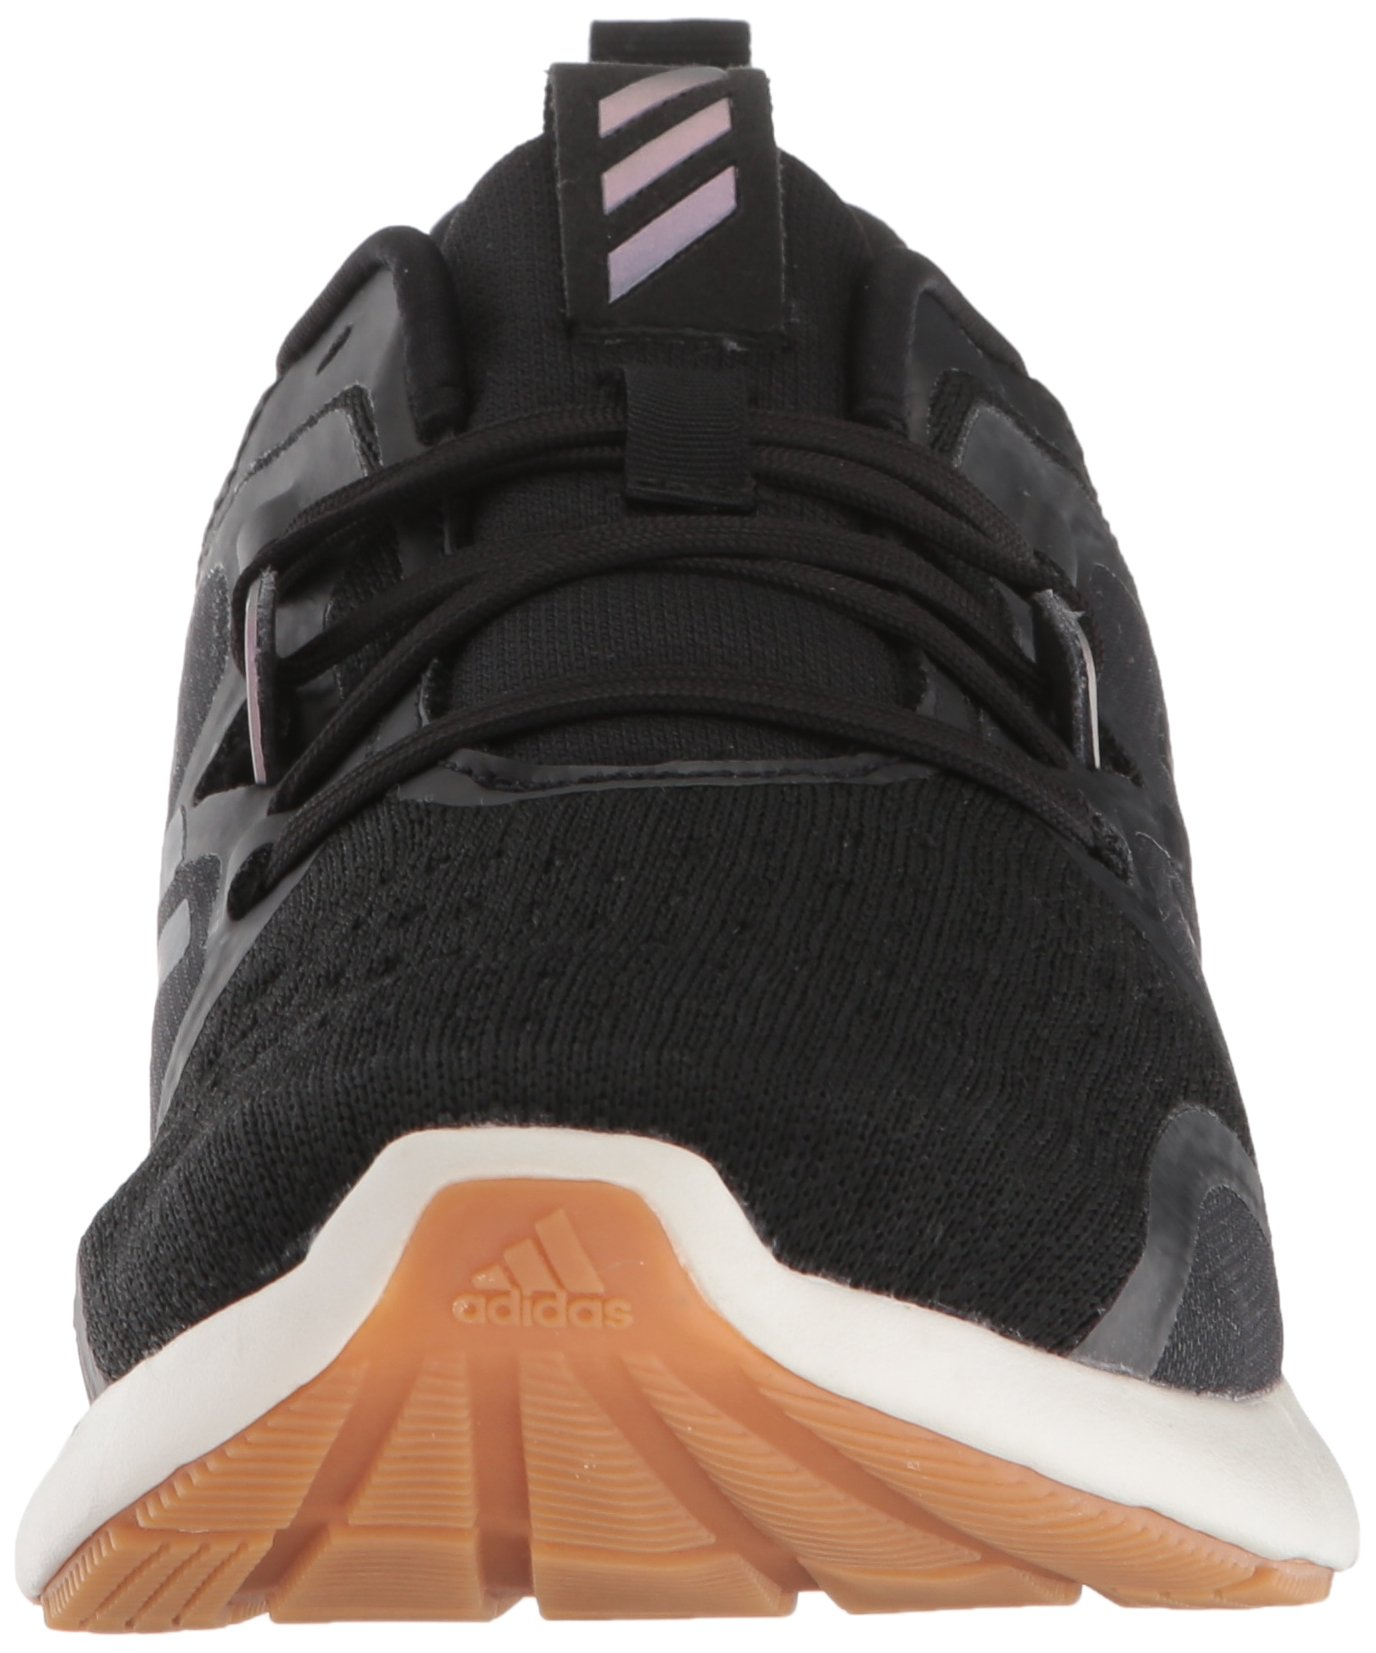 adidas Women's Edgebounce Running Shoe Black/Night Metallic, 5.5 M US by adidas (Image #4)